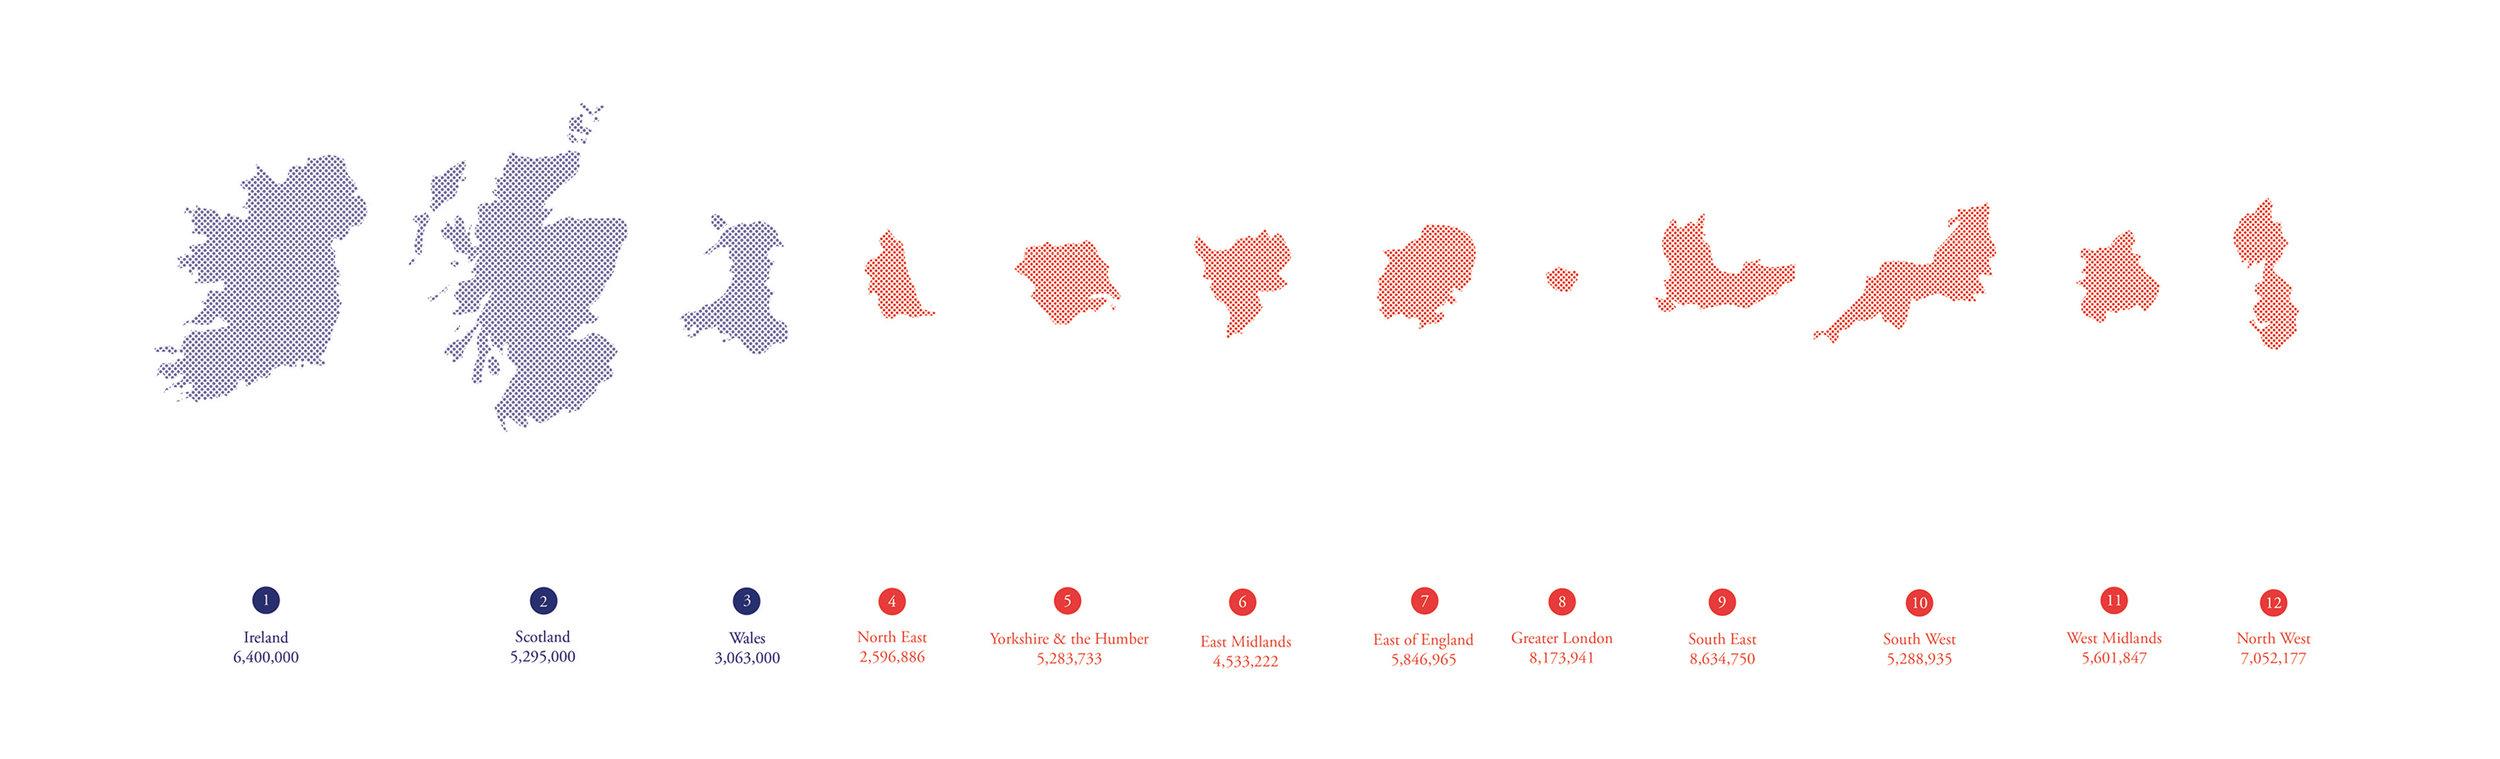 Region states.jpg